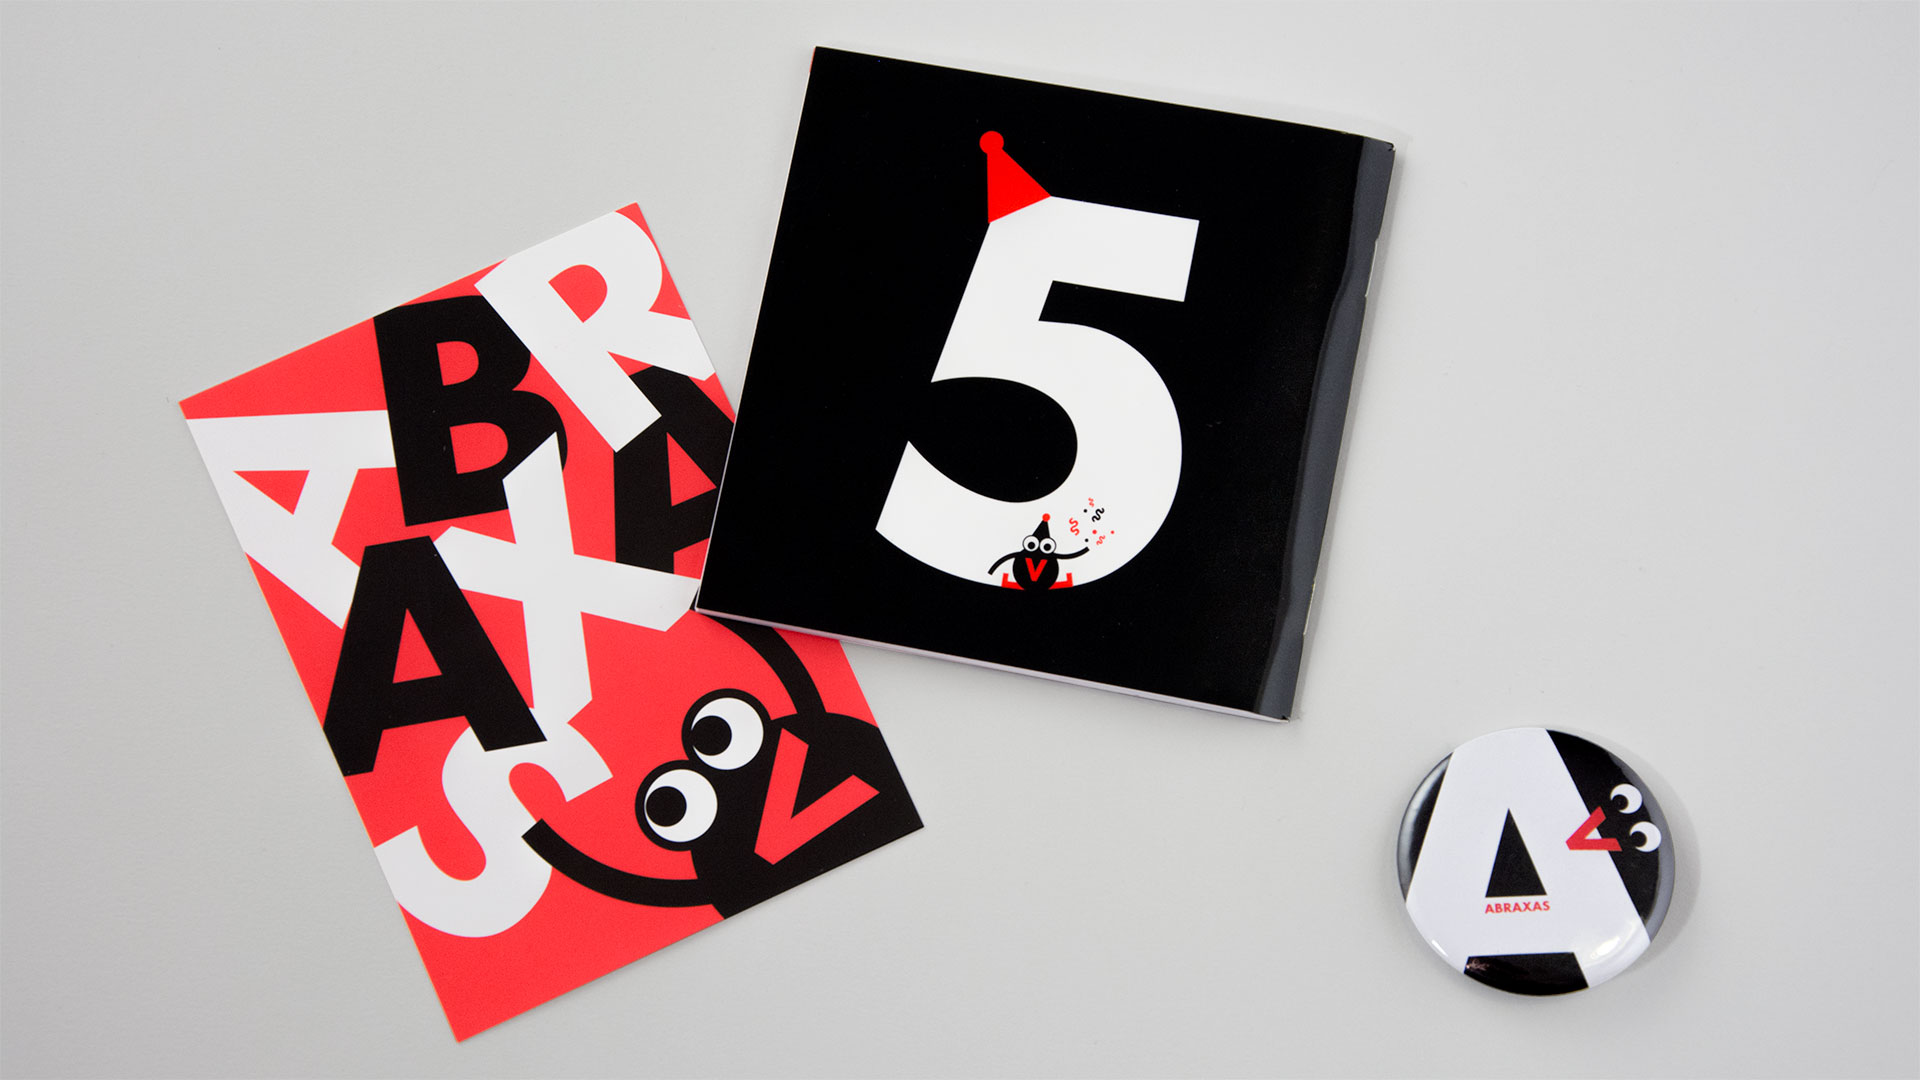 equipe-visuelle-grafik-design-luzern-emmenbruecke-abraxas-literatur-festival-kinder-corporate-design